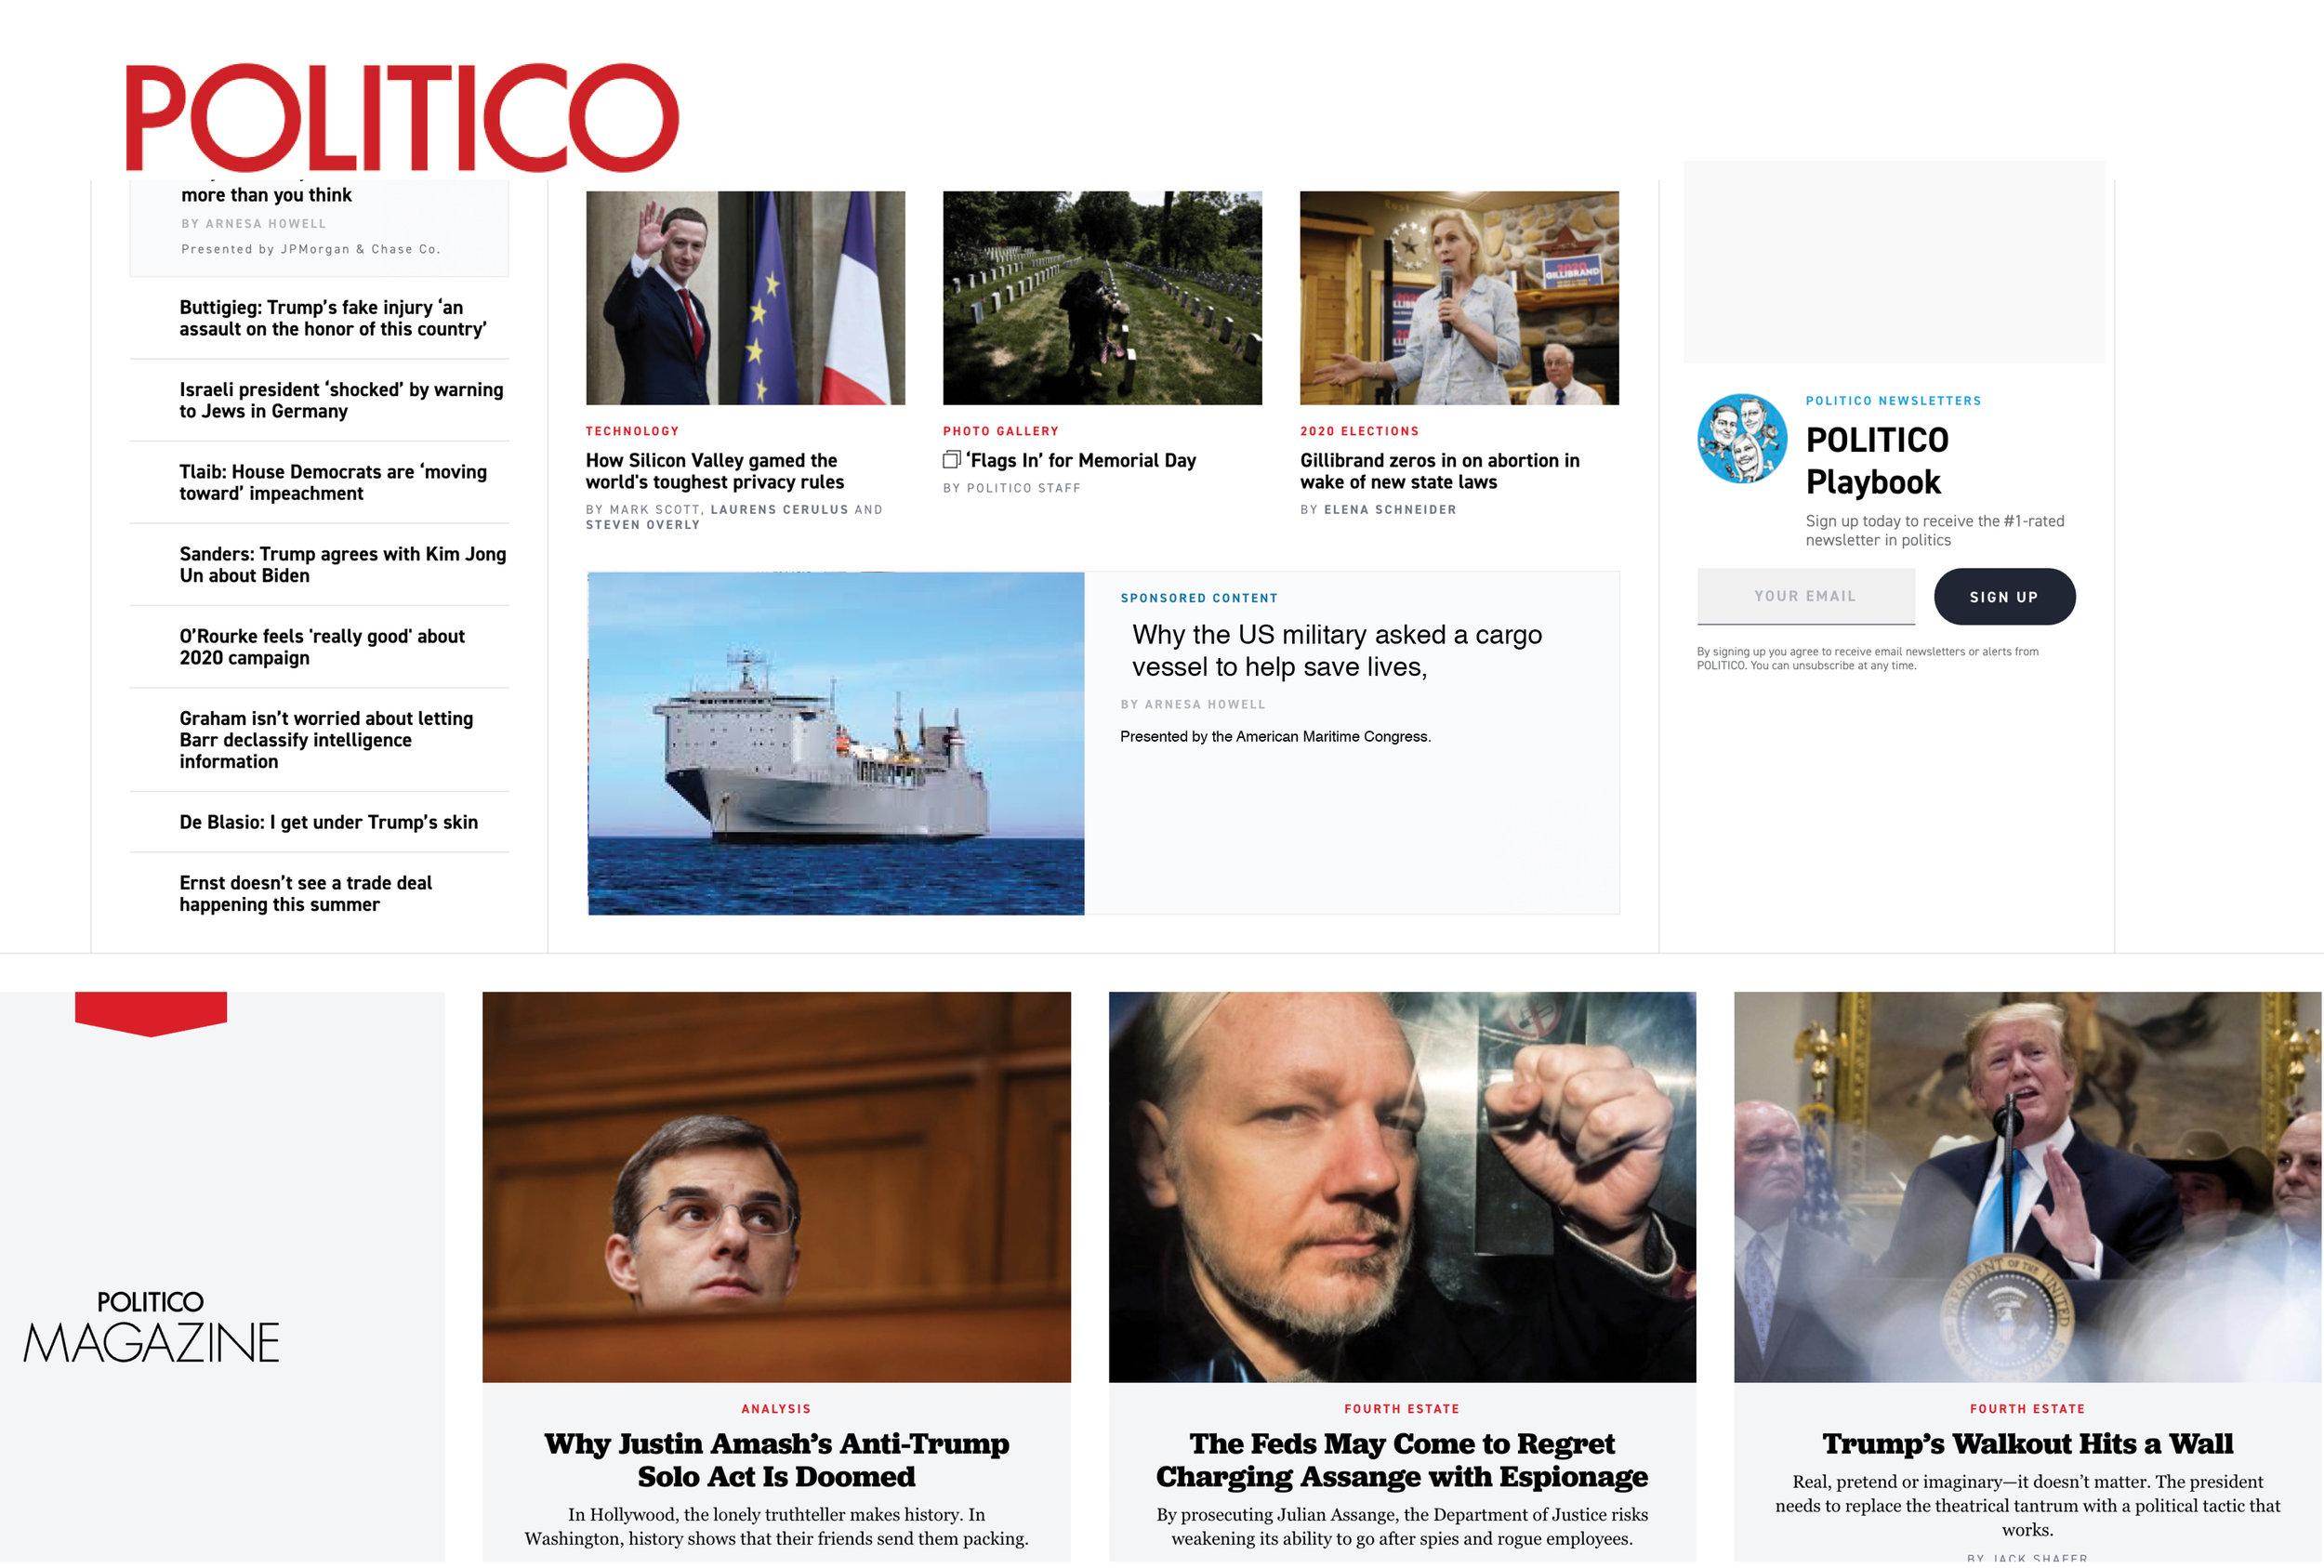 Politico_01.jpg